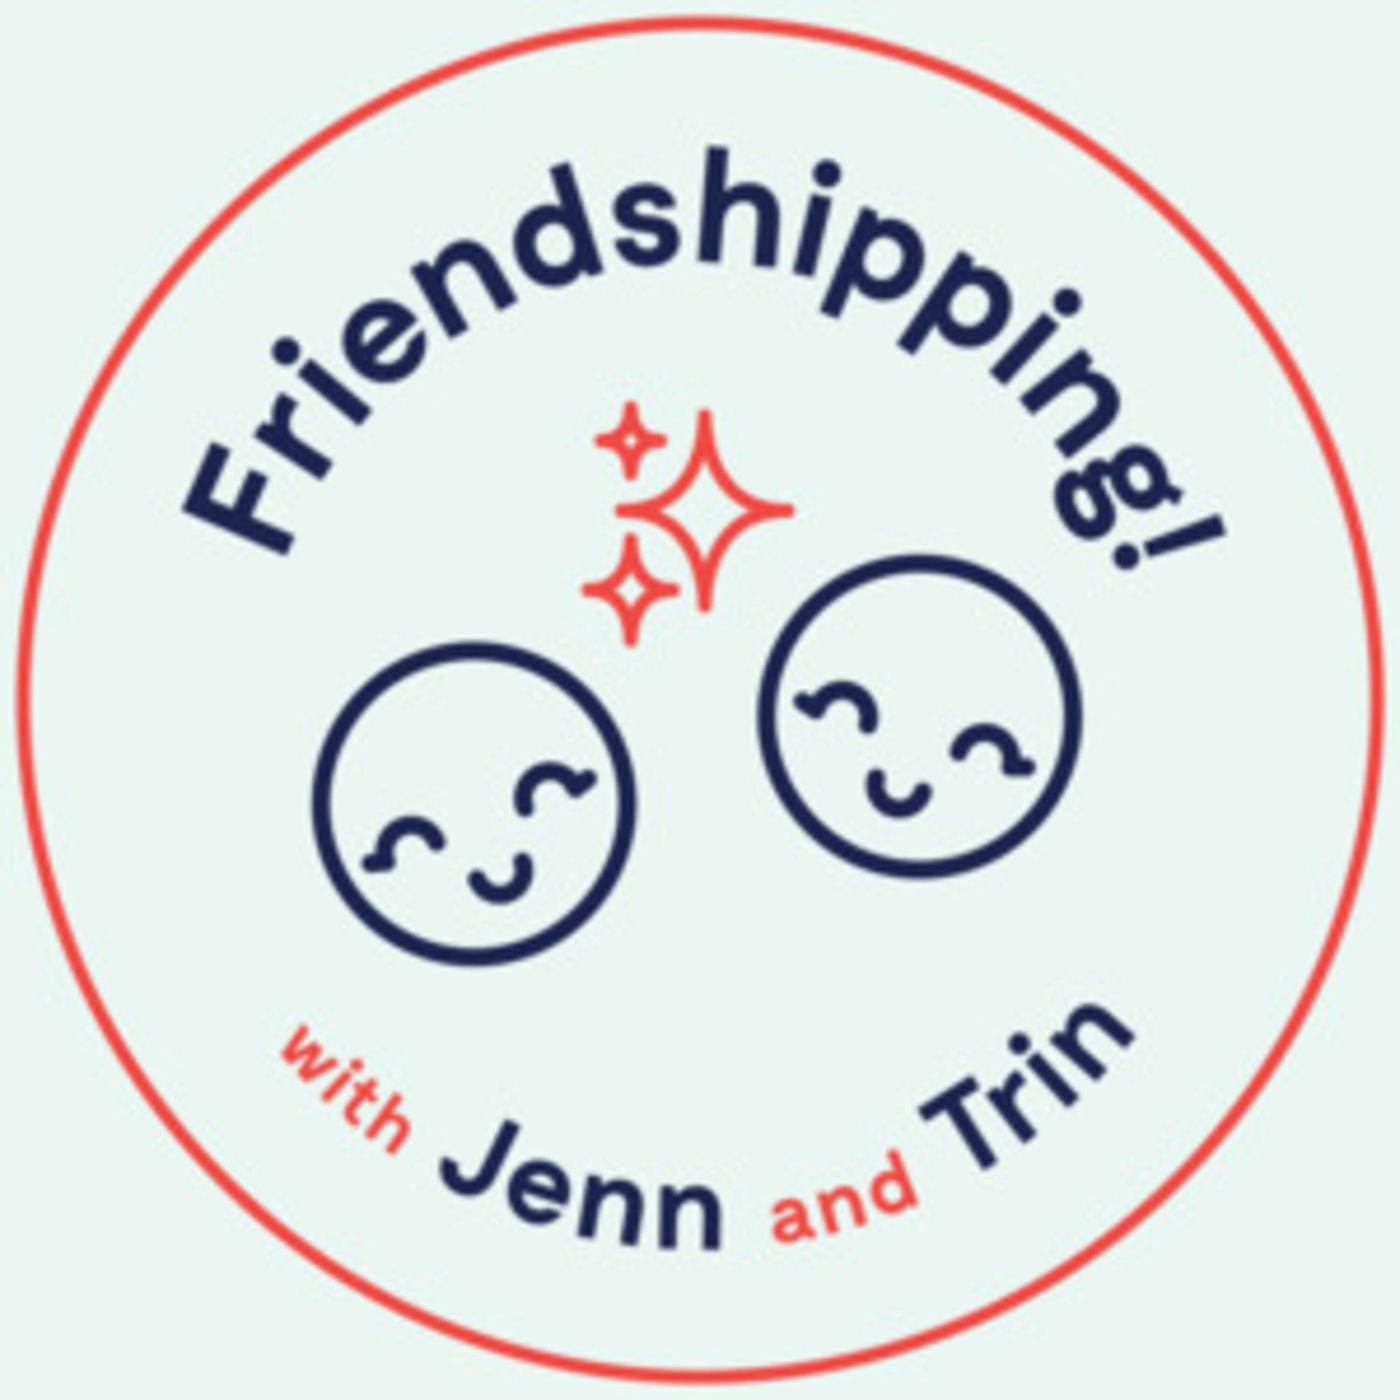 Friendshipping!